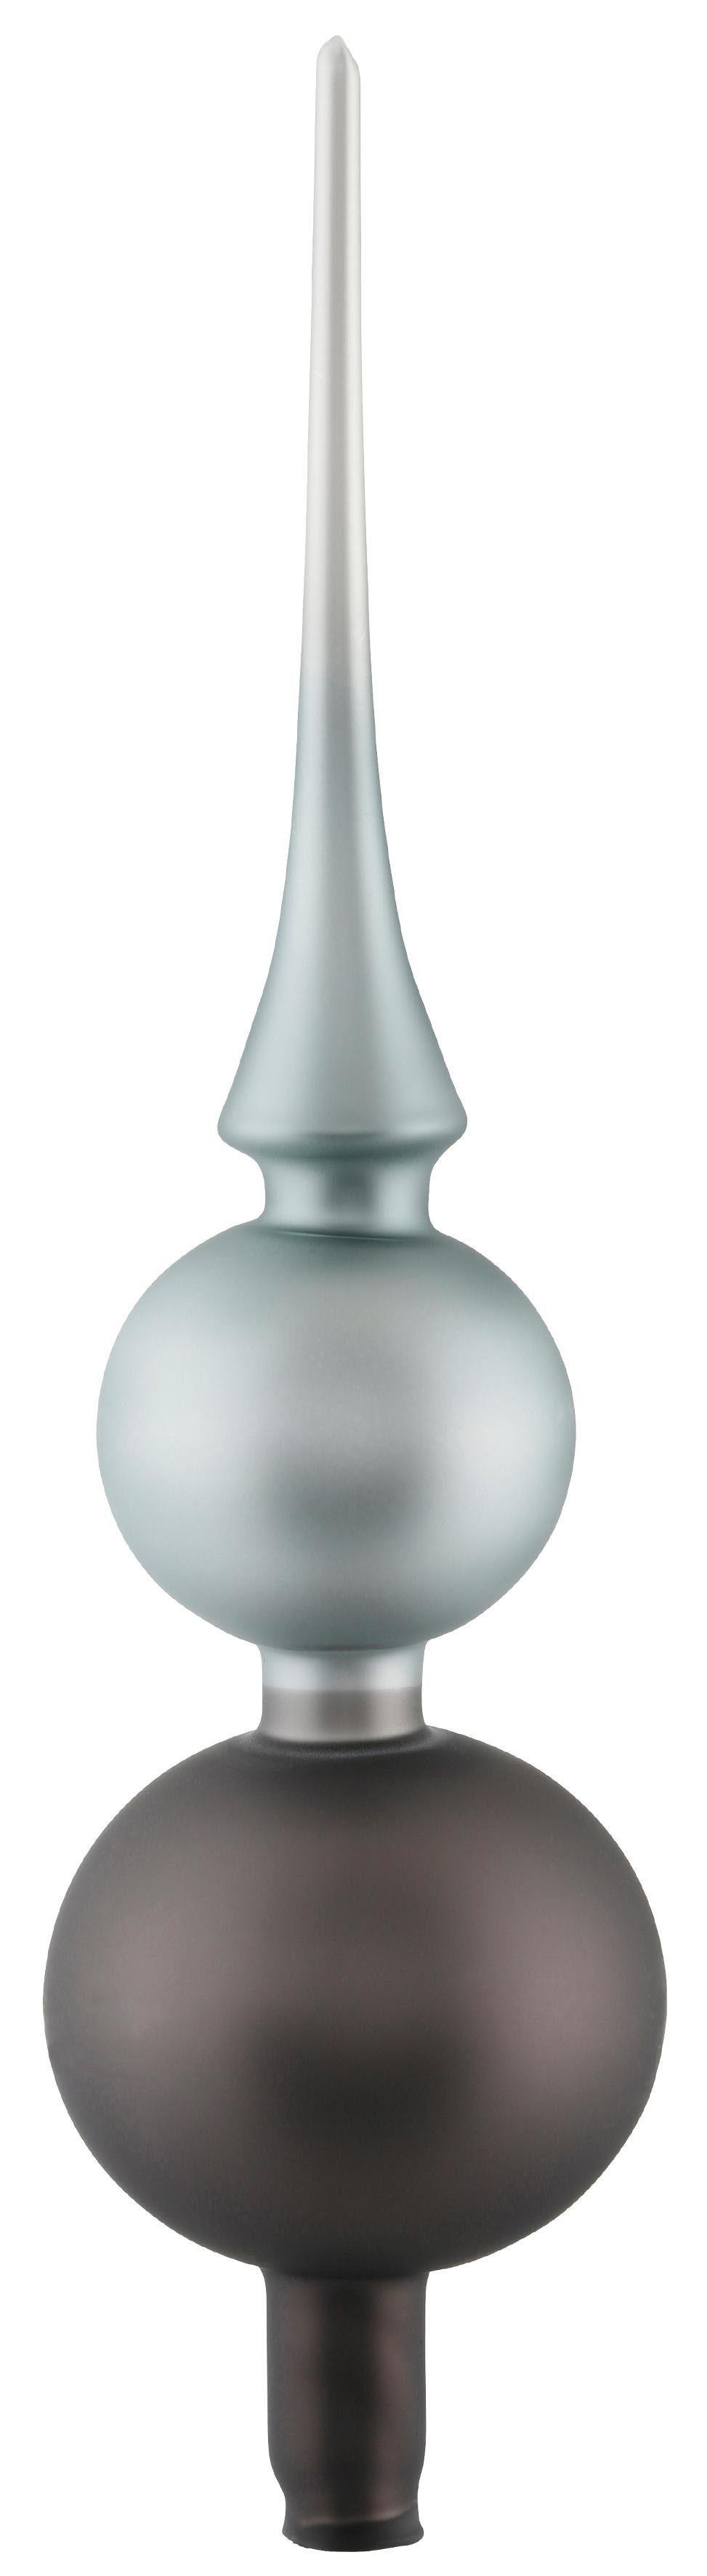 Thüringer Glasdesign Christbaumschmuck »Raw Atmosphere«